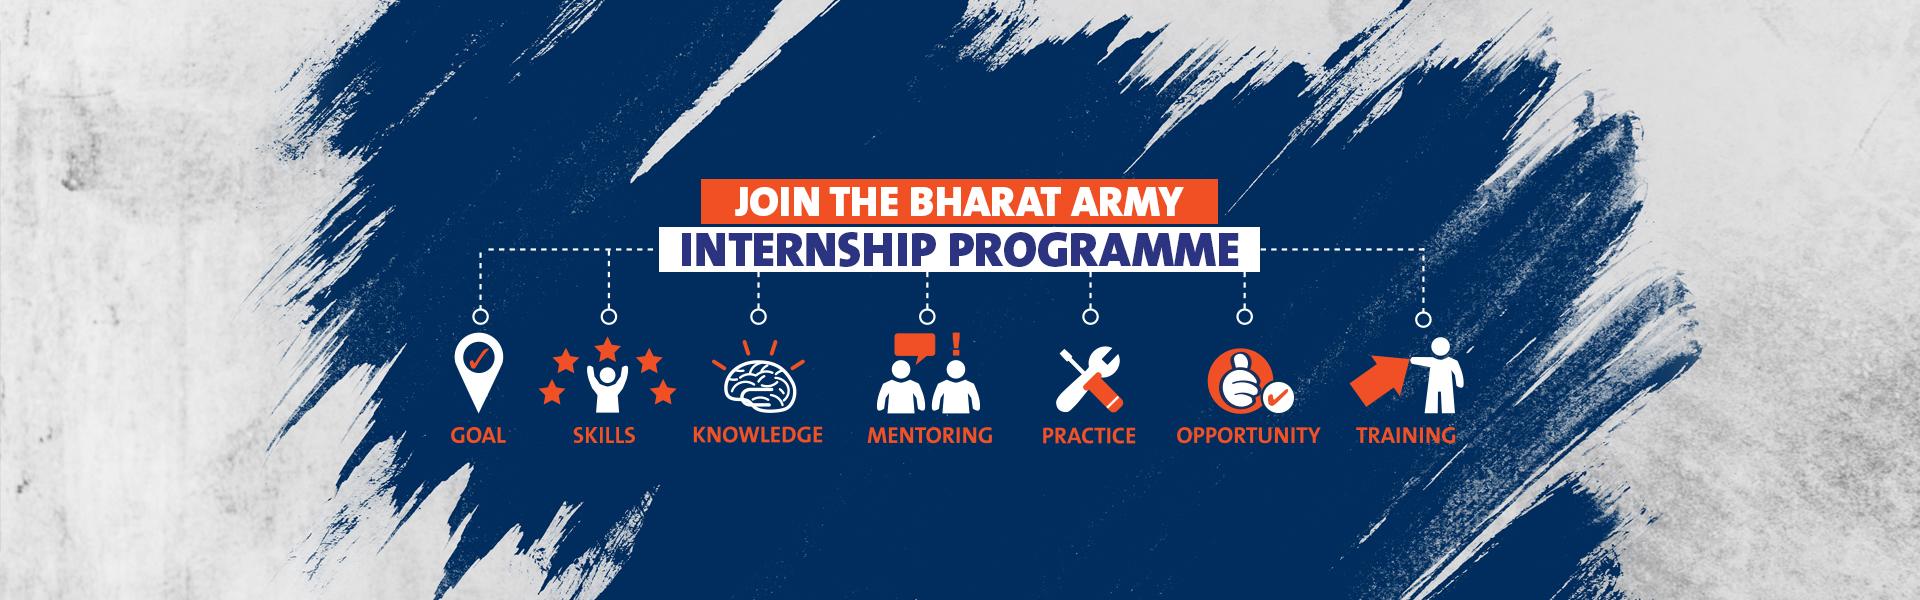 The Bharat Army Internship Programme